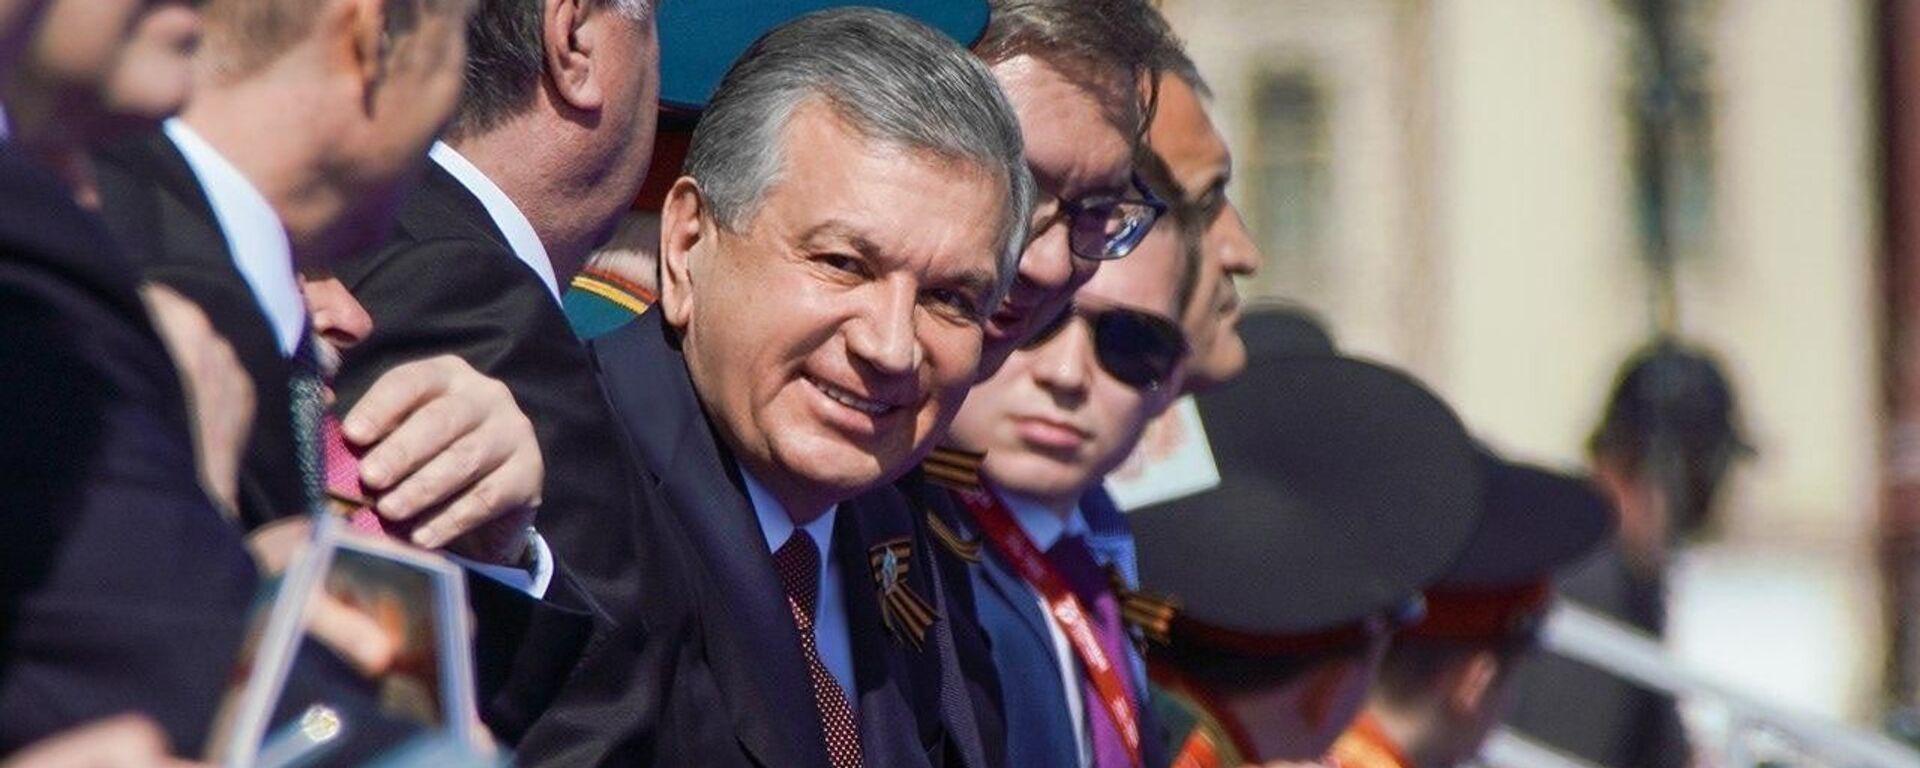 Президент Узбекистана Шавкат Мирзиёев на Красной площади во время парада  - Sputnik Узбекистан, 1920, 24.06.2020